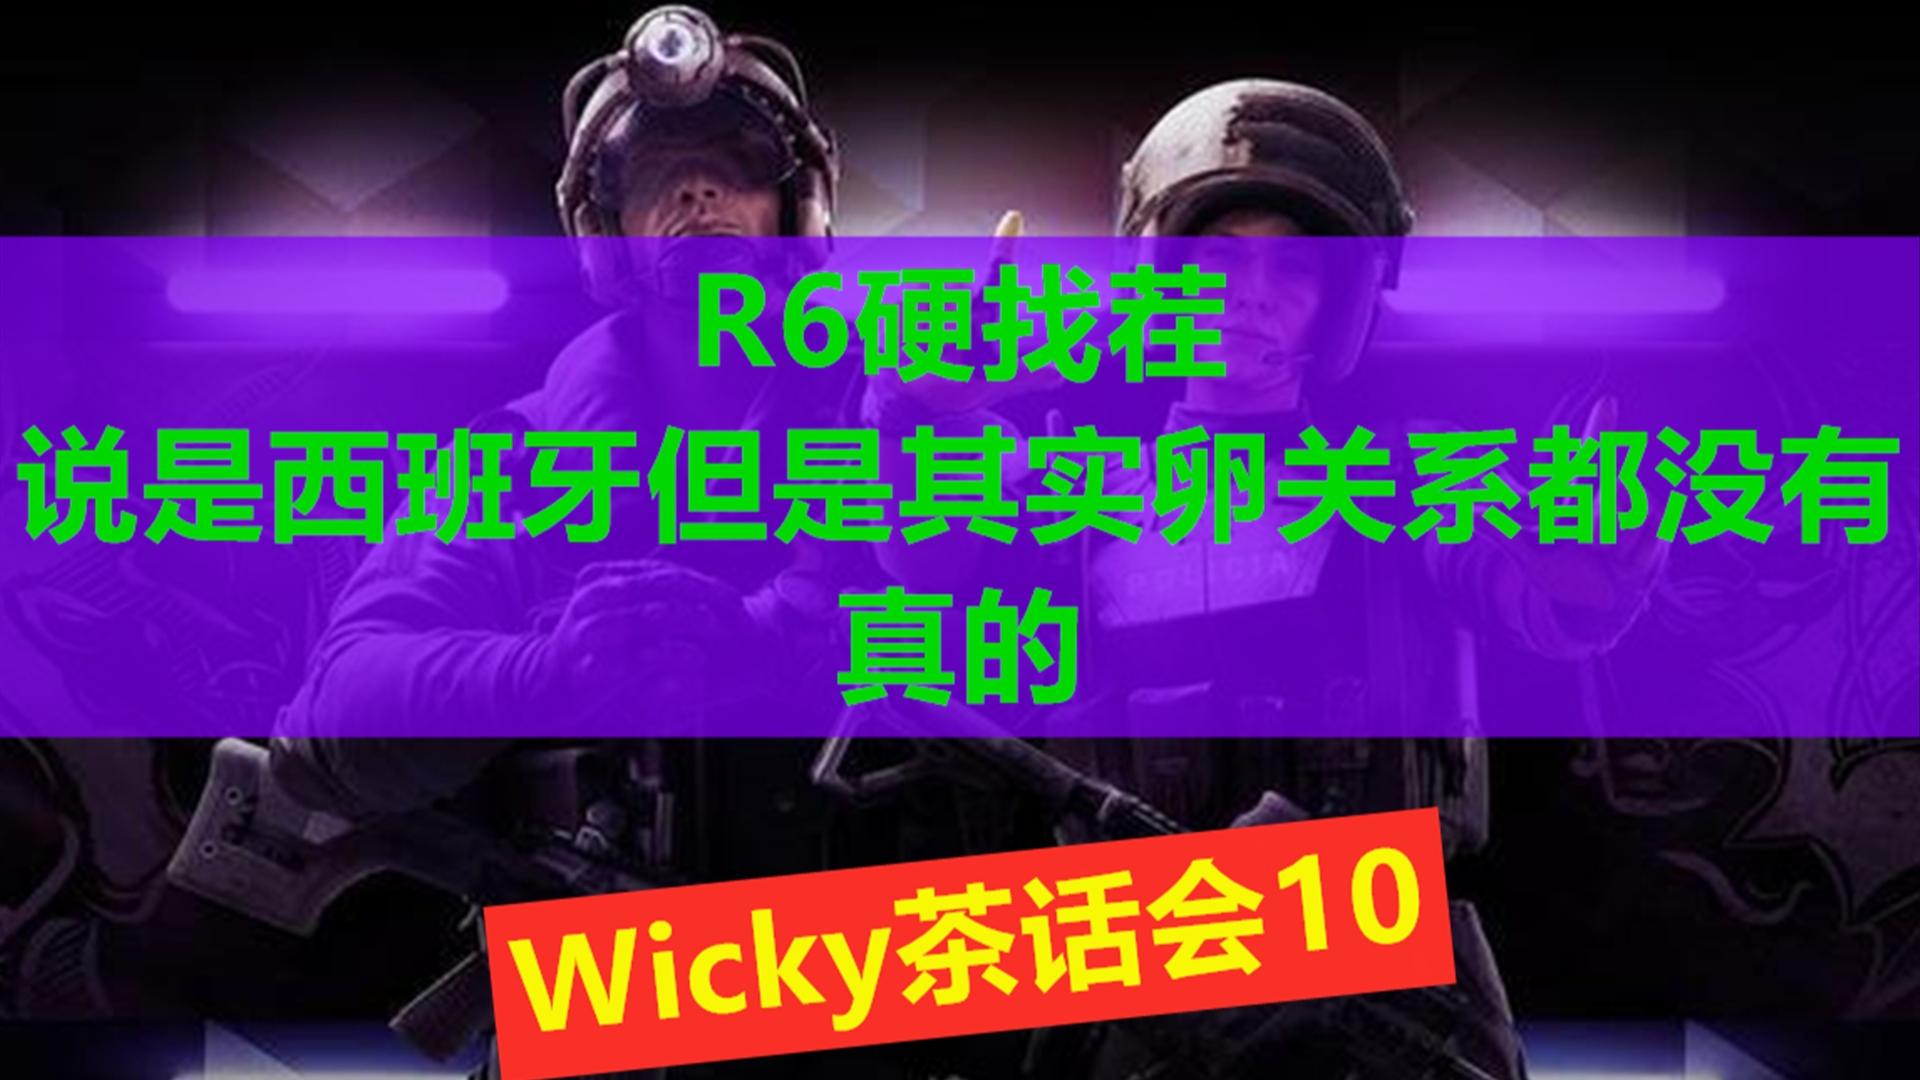 【R6硬找茬】第十期 GEO(西班牙反恐特别行动小组)【Wicky茶话会10】